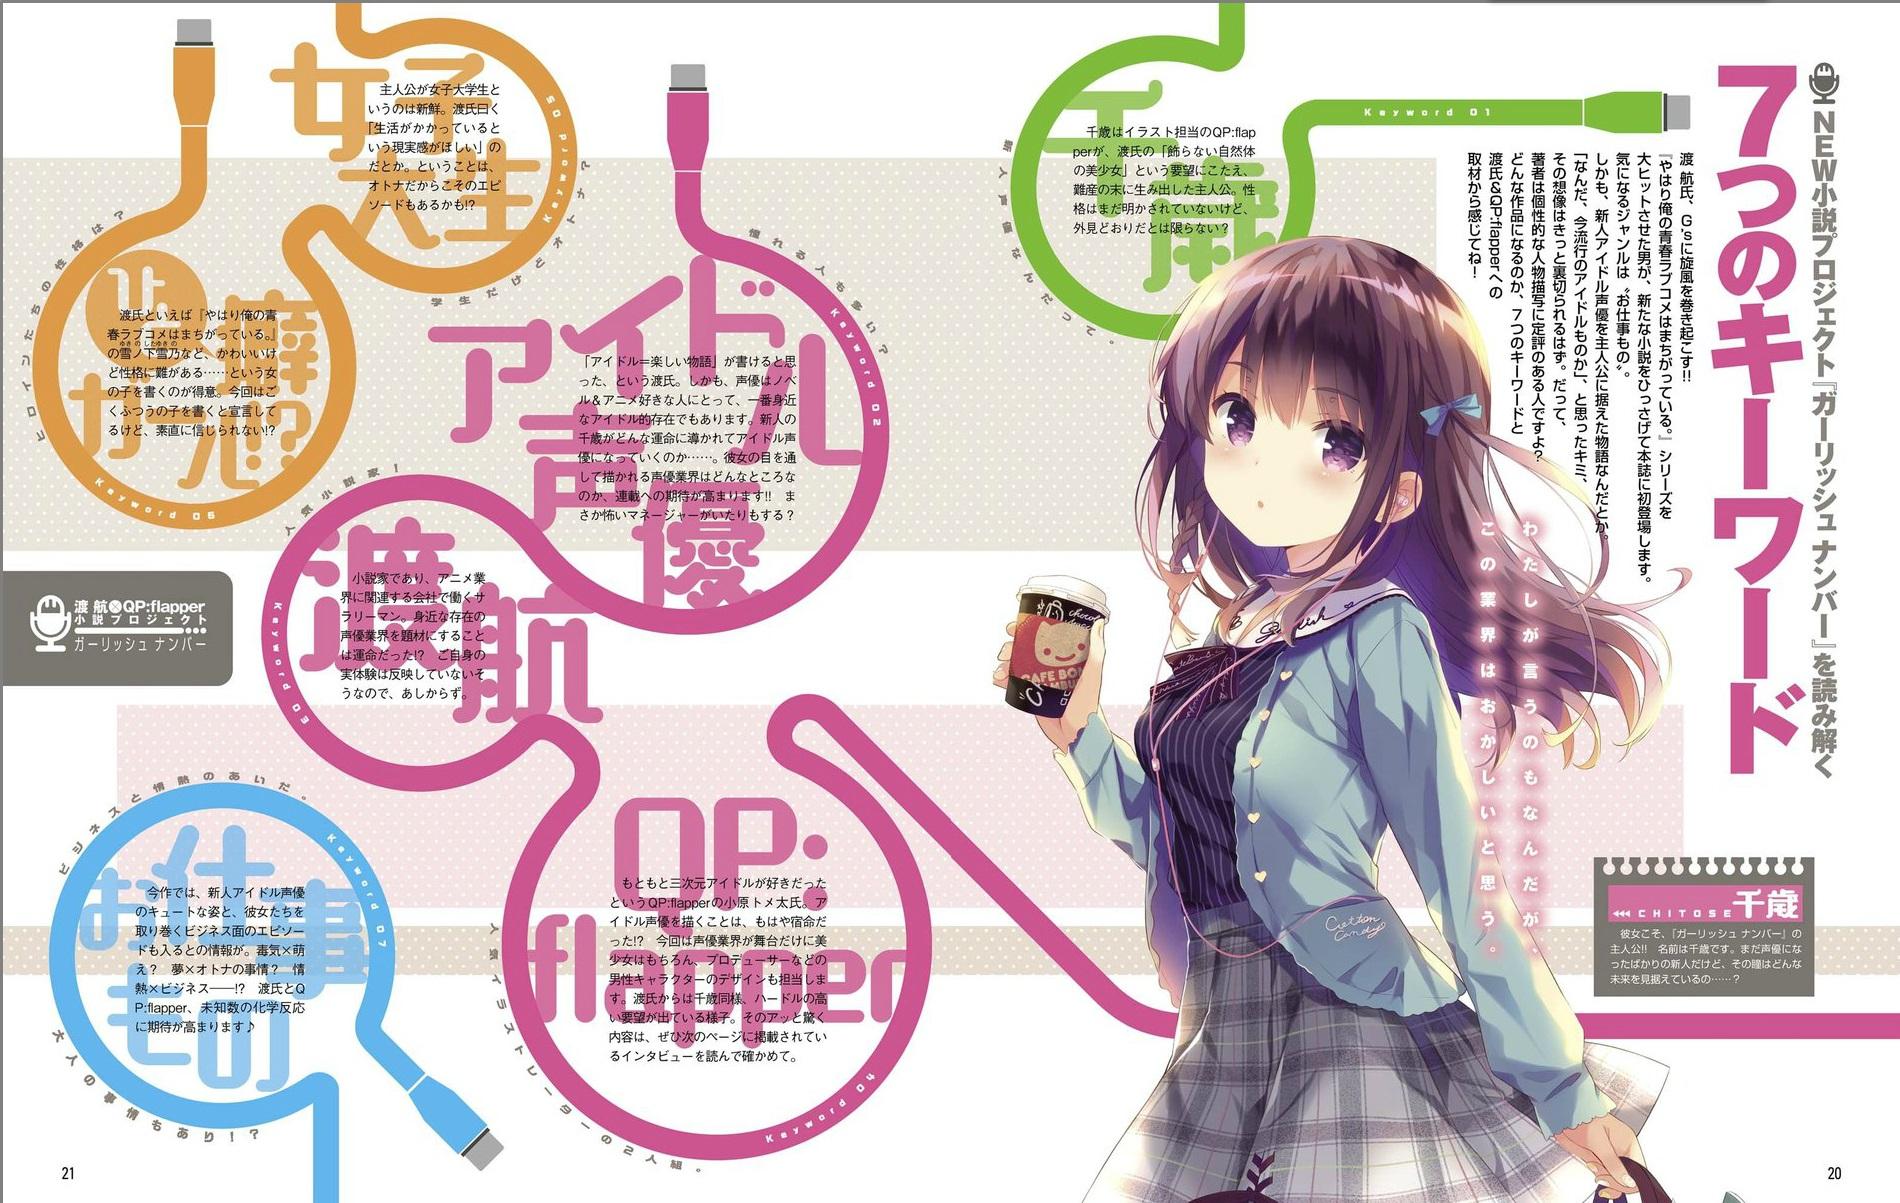 Original Anime Girlish Number Announced January 2016 issue of Dengeki G's magazine 2